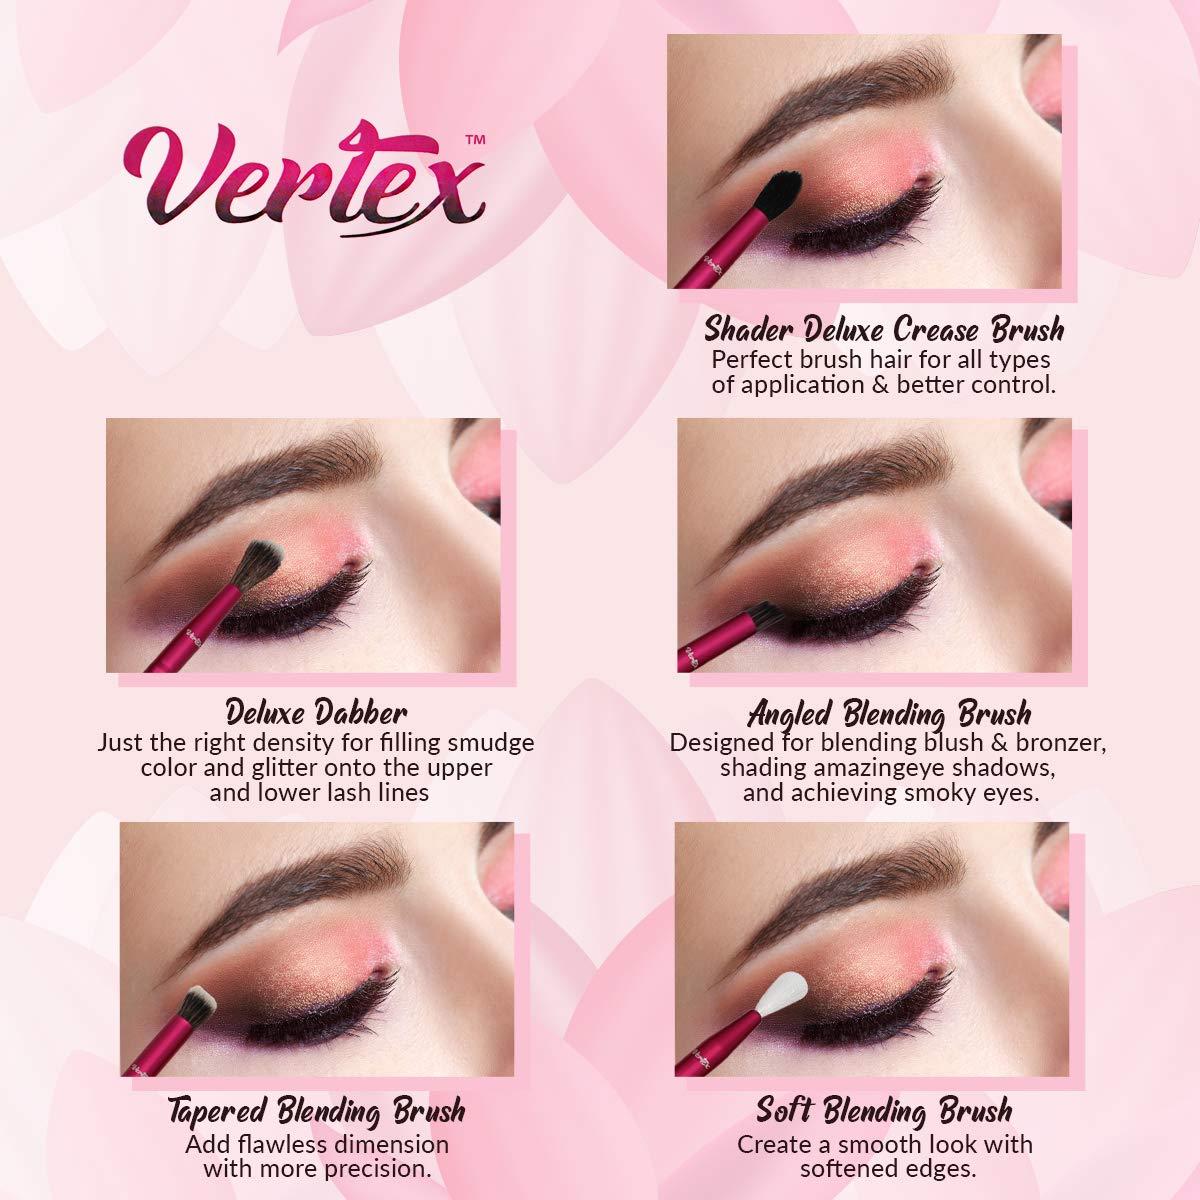 Makeup Eye Shadow Blending Brush Cut Crease Brush Set Pro Shader For Smooth Soft Finishes Tapered Brushes Soft Blender Expert Eyeshadow Shading Effortlessly Blend & Shade Cream Powder Highlighter: Beauty